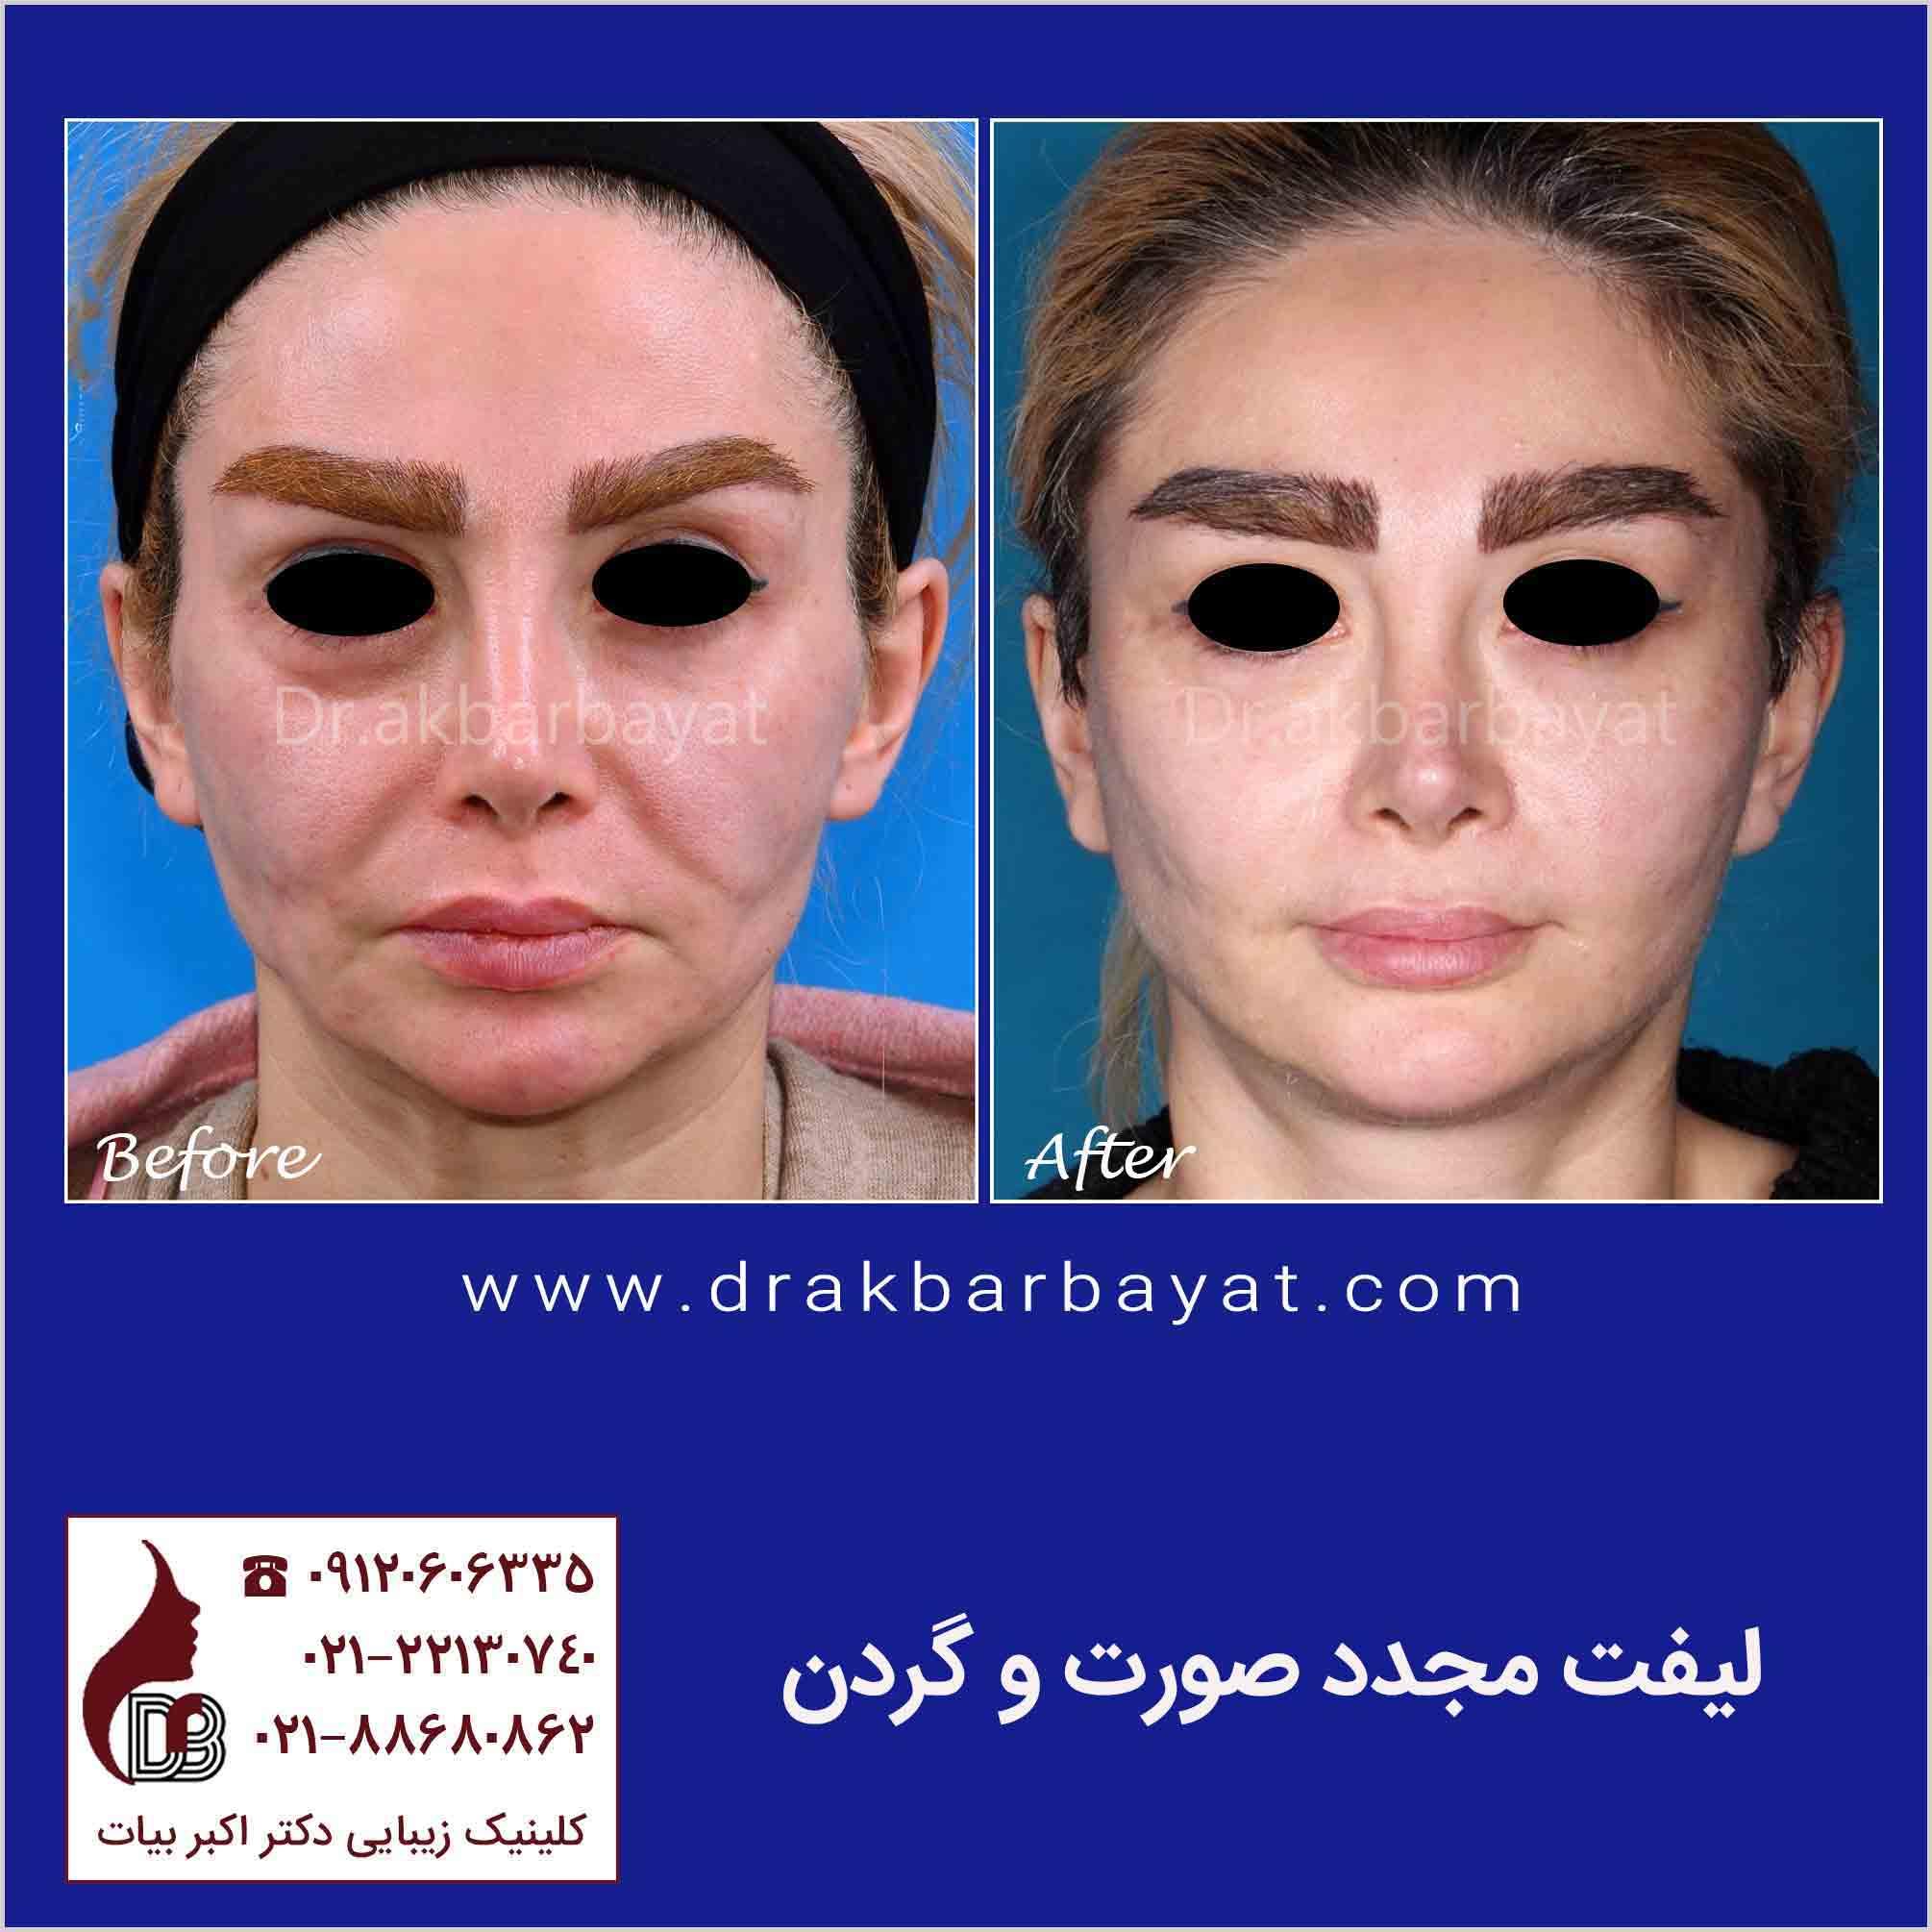 جراحی مجدد لیفت صورت   جراحی مجدد لیفتینگ صورت   بهترین جراح لیفت صورت در تهران